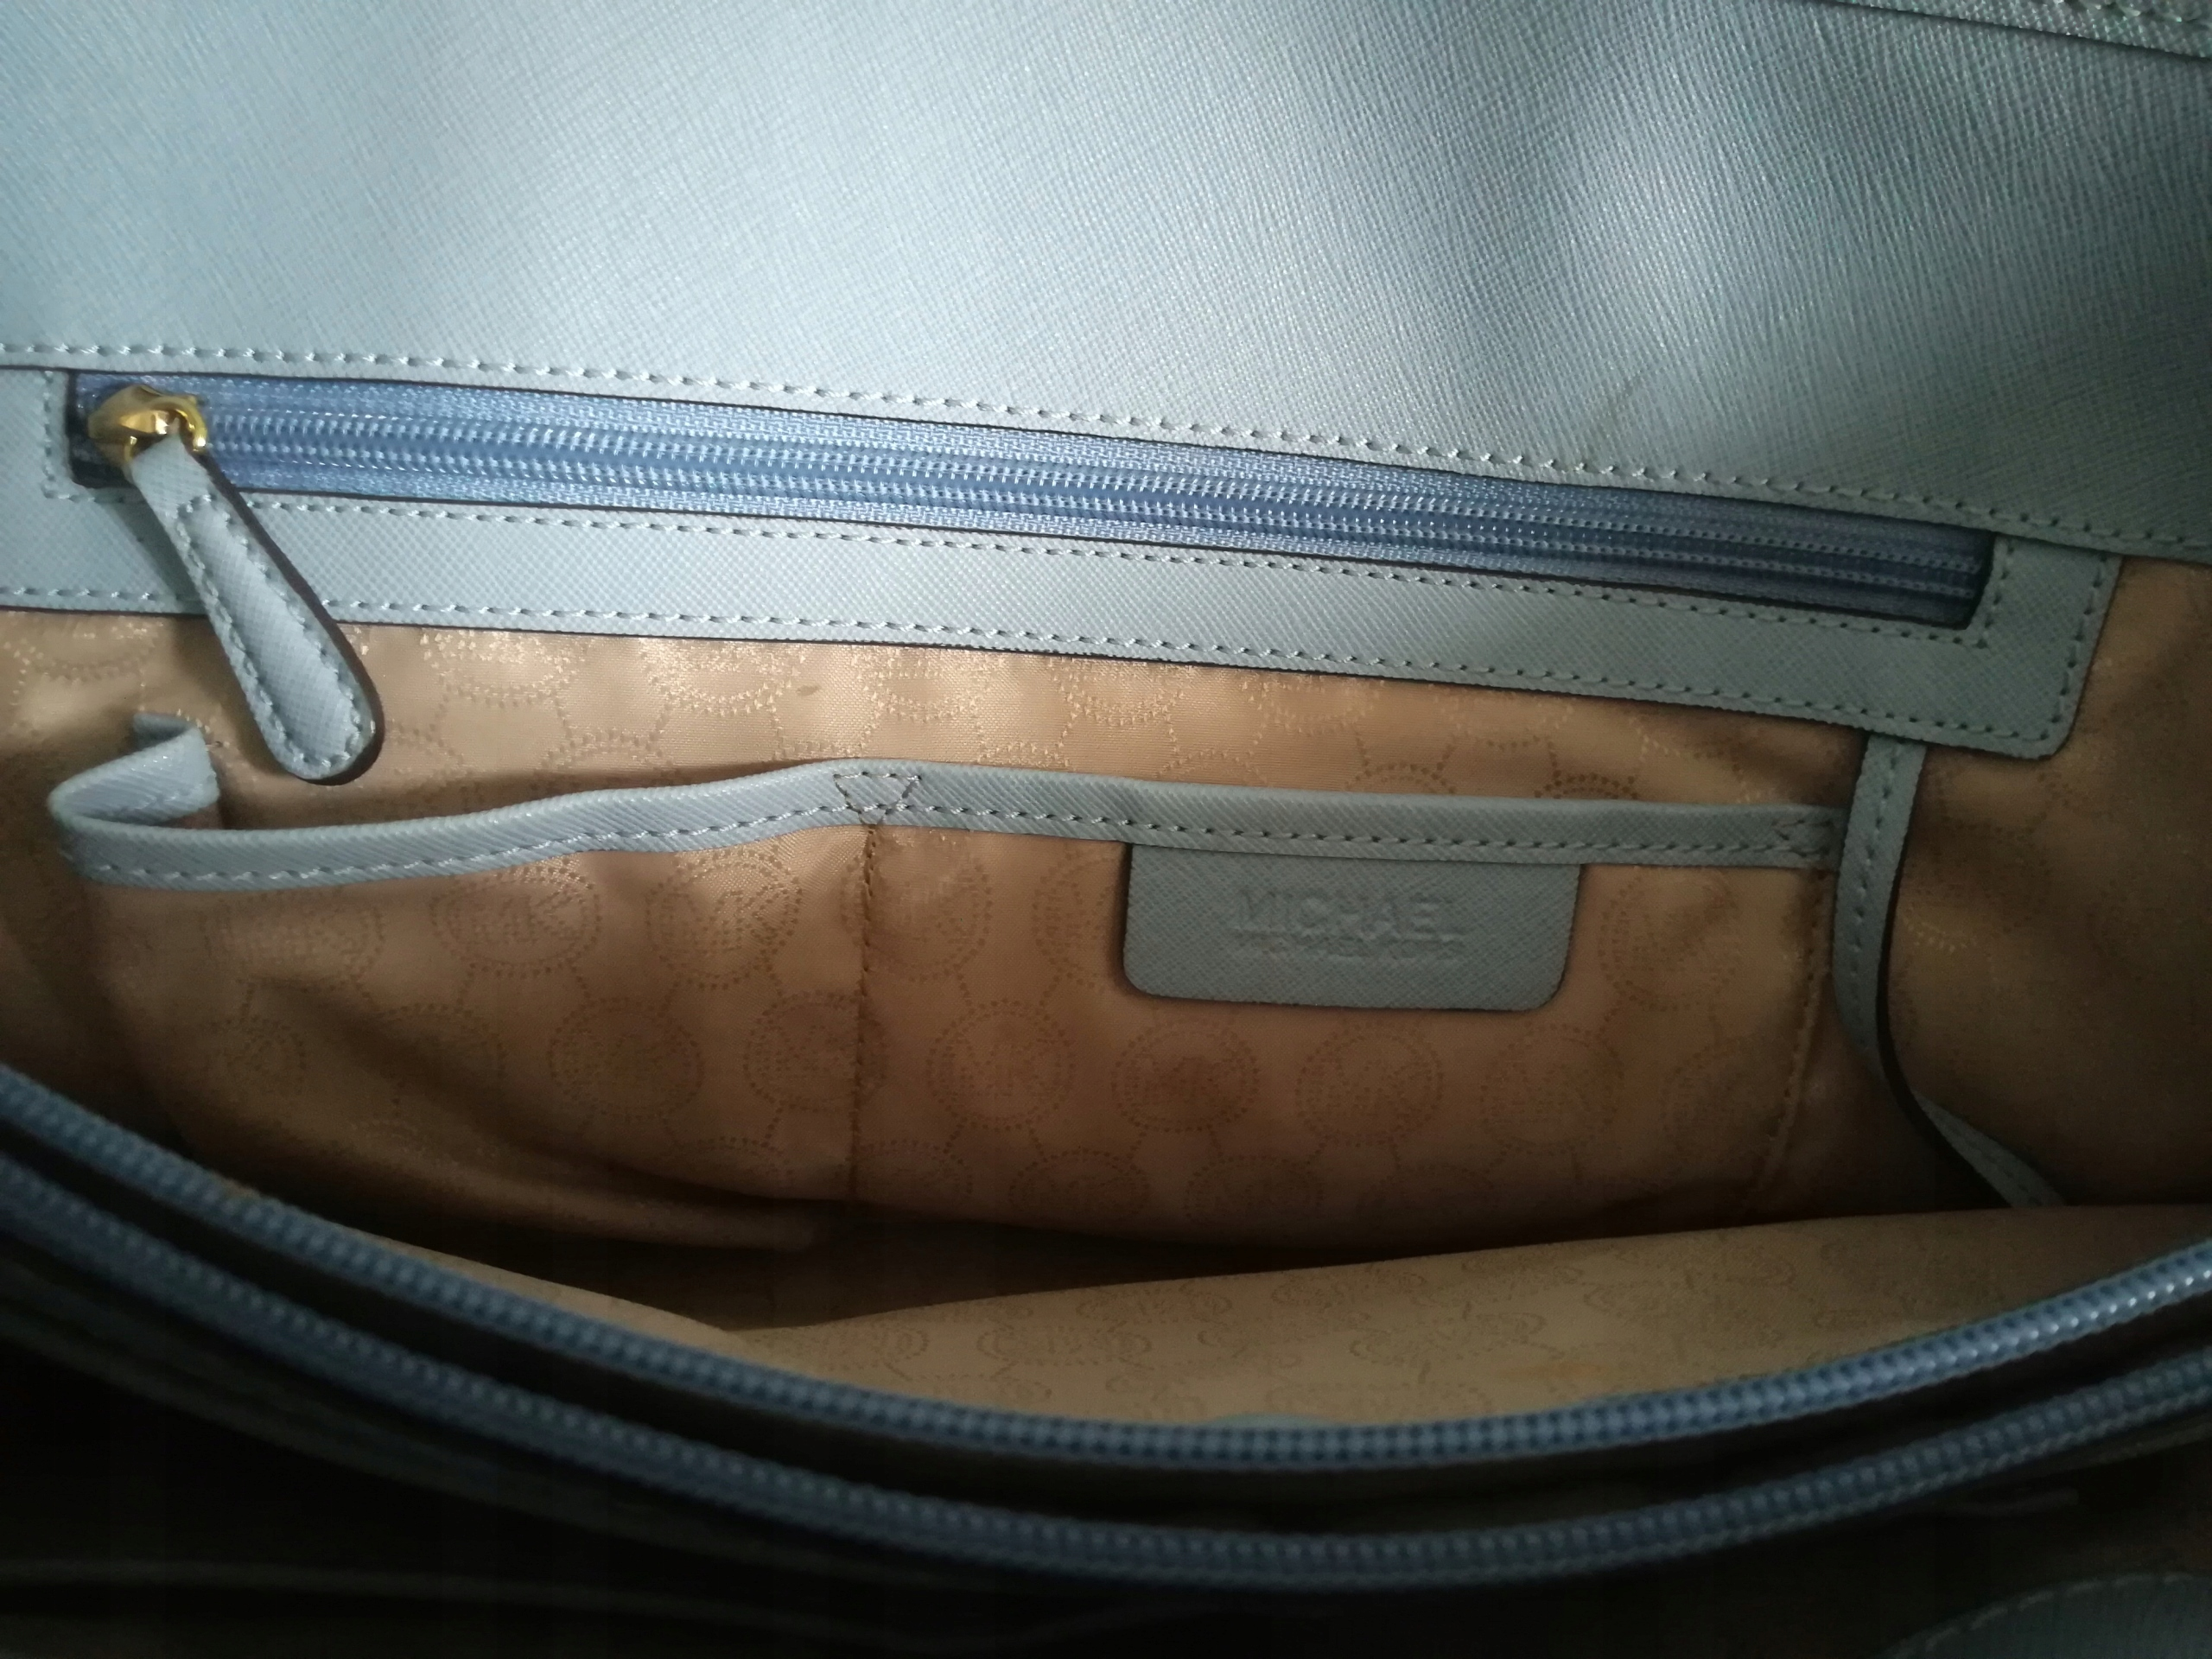 efd77215396b1 Błękitna torba shopper Michael Kors Jet Set travel - 7474106141 ...